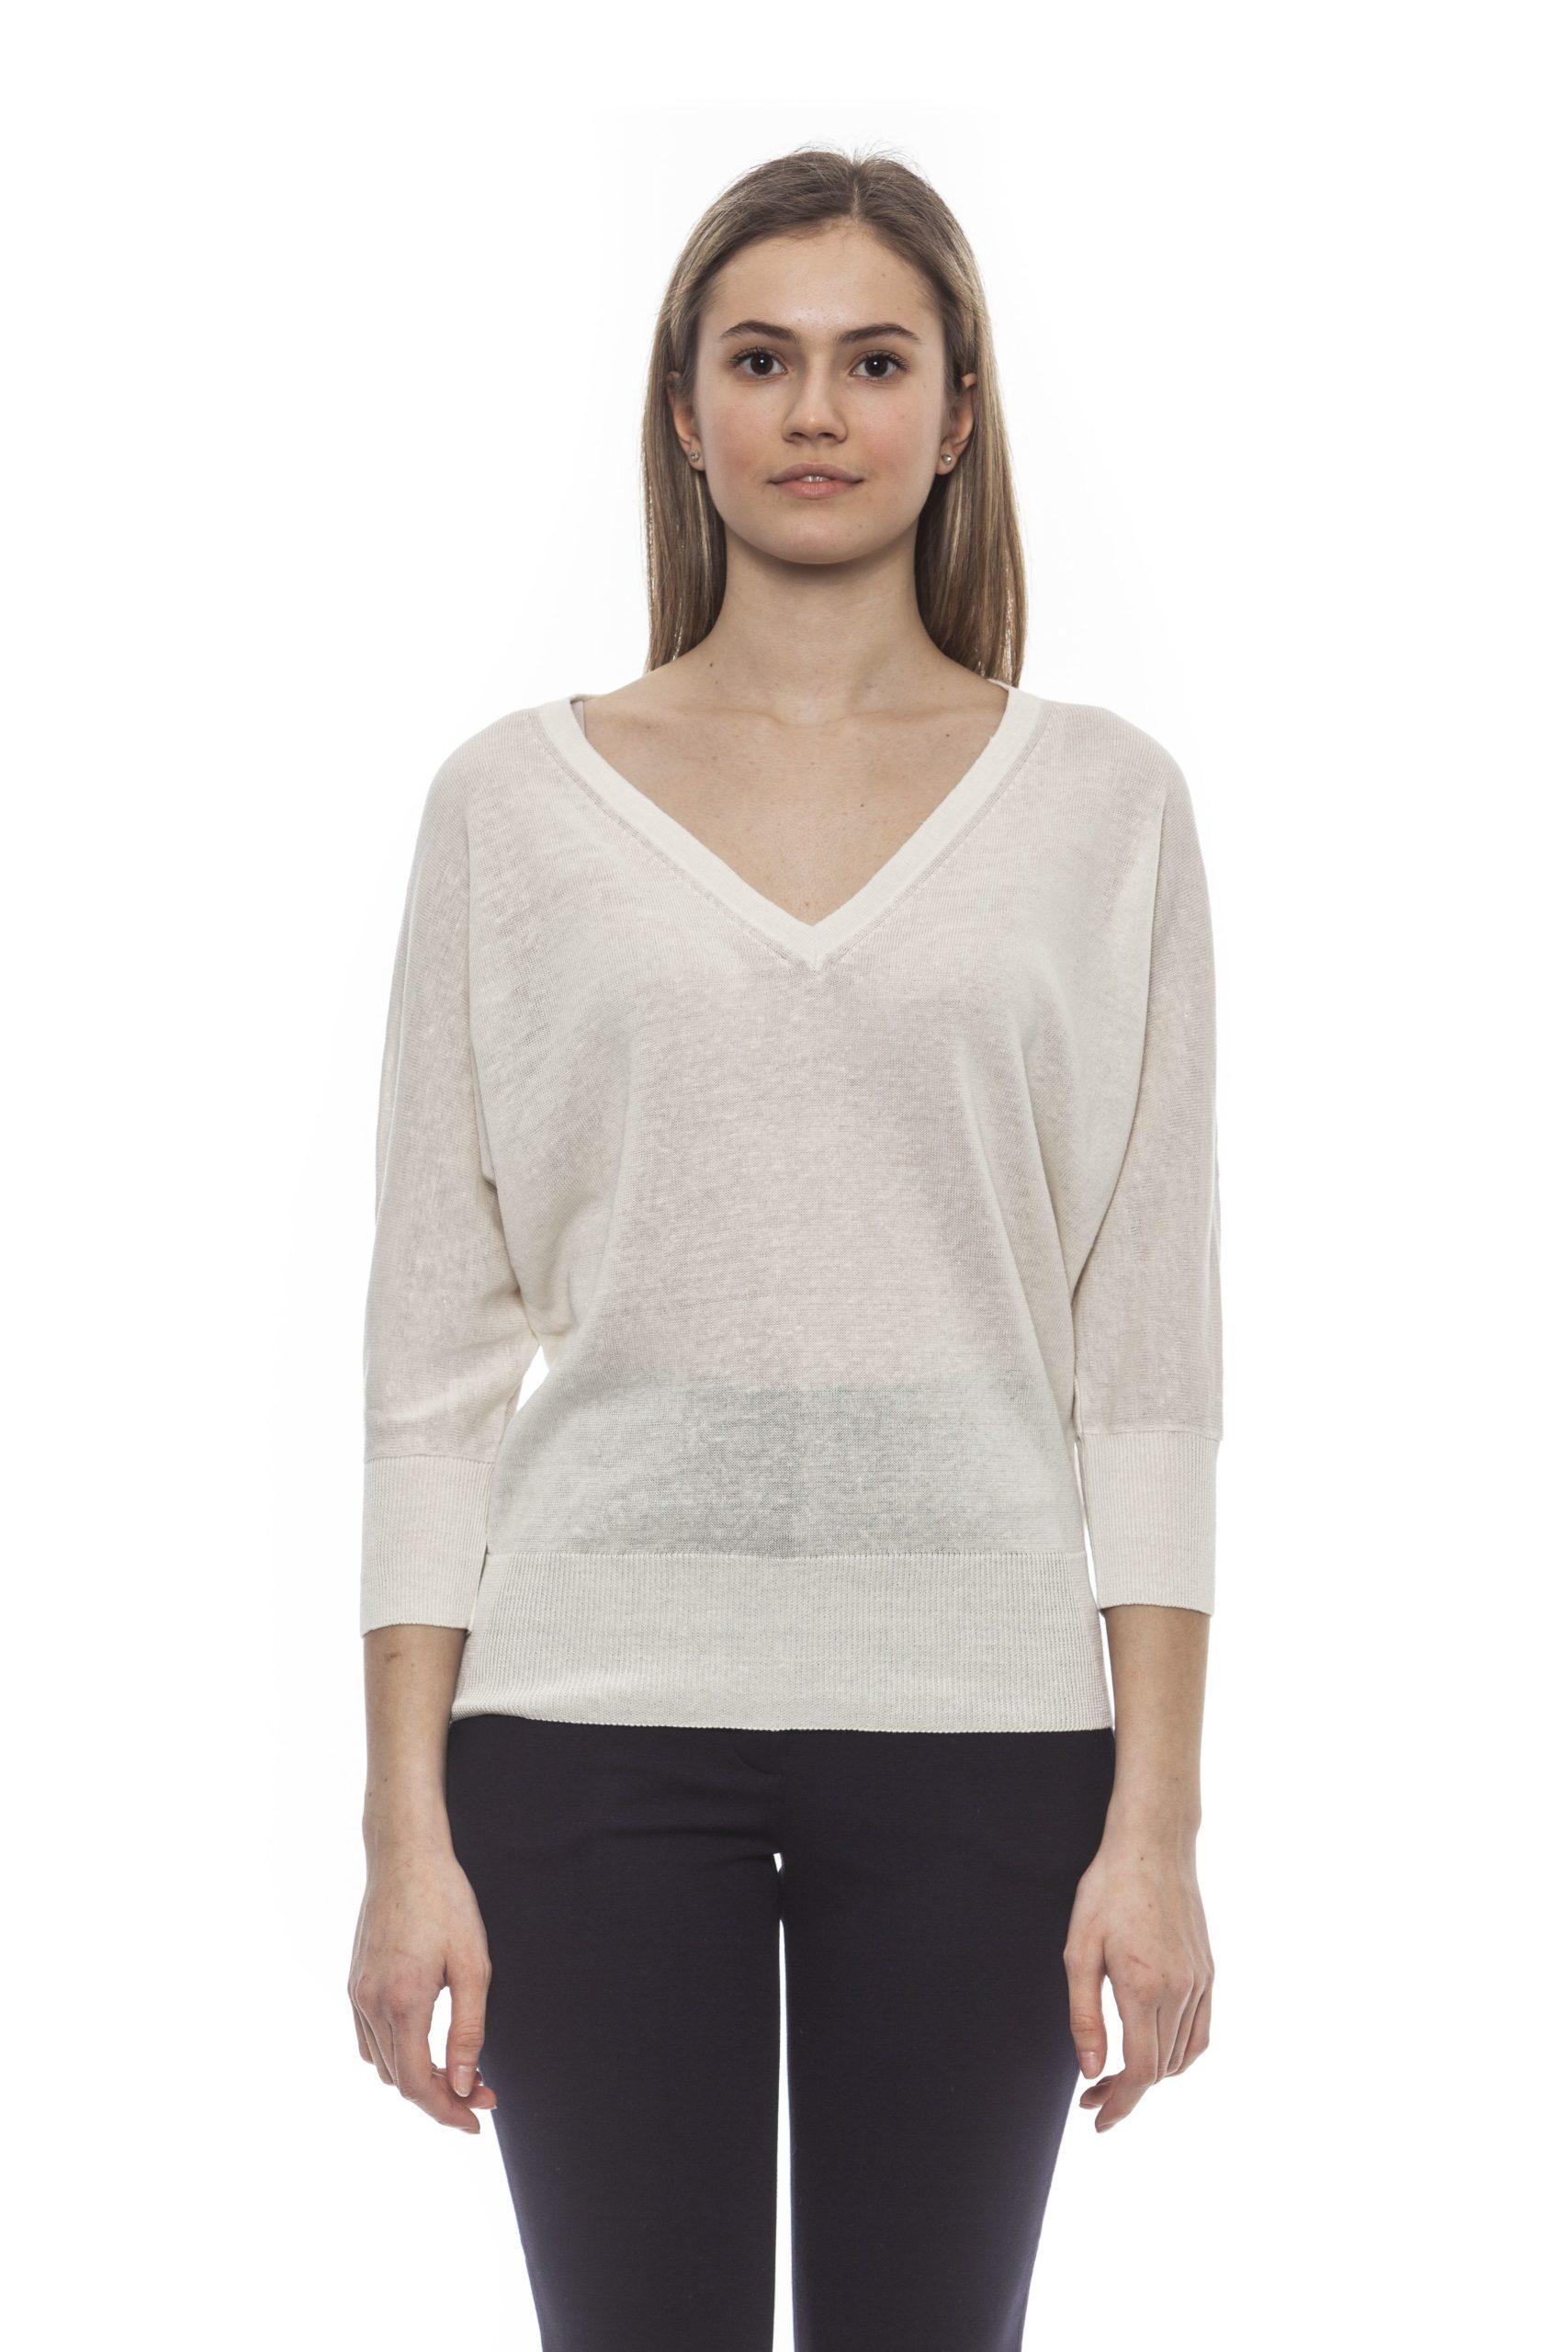 Peserico Women's Bianco Sweater White PE1383112 - IT42 | S